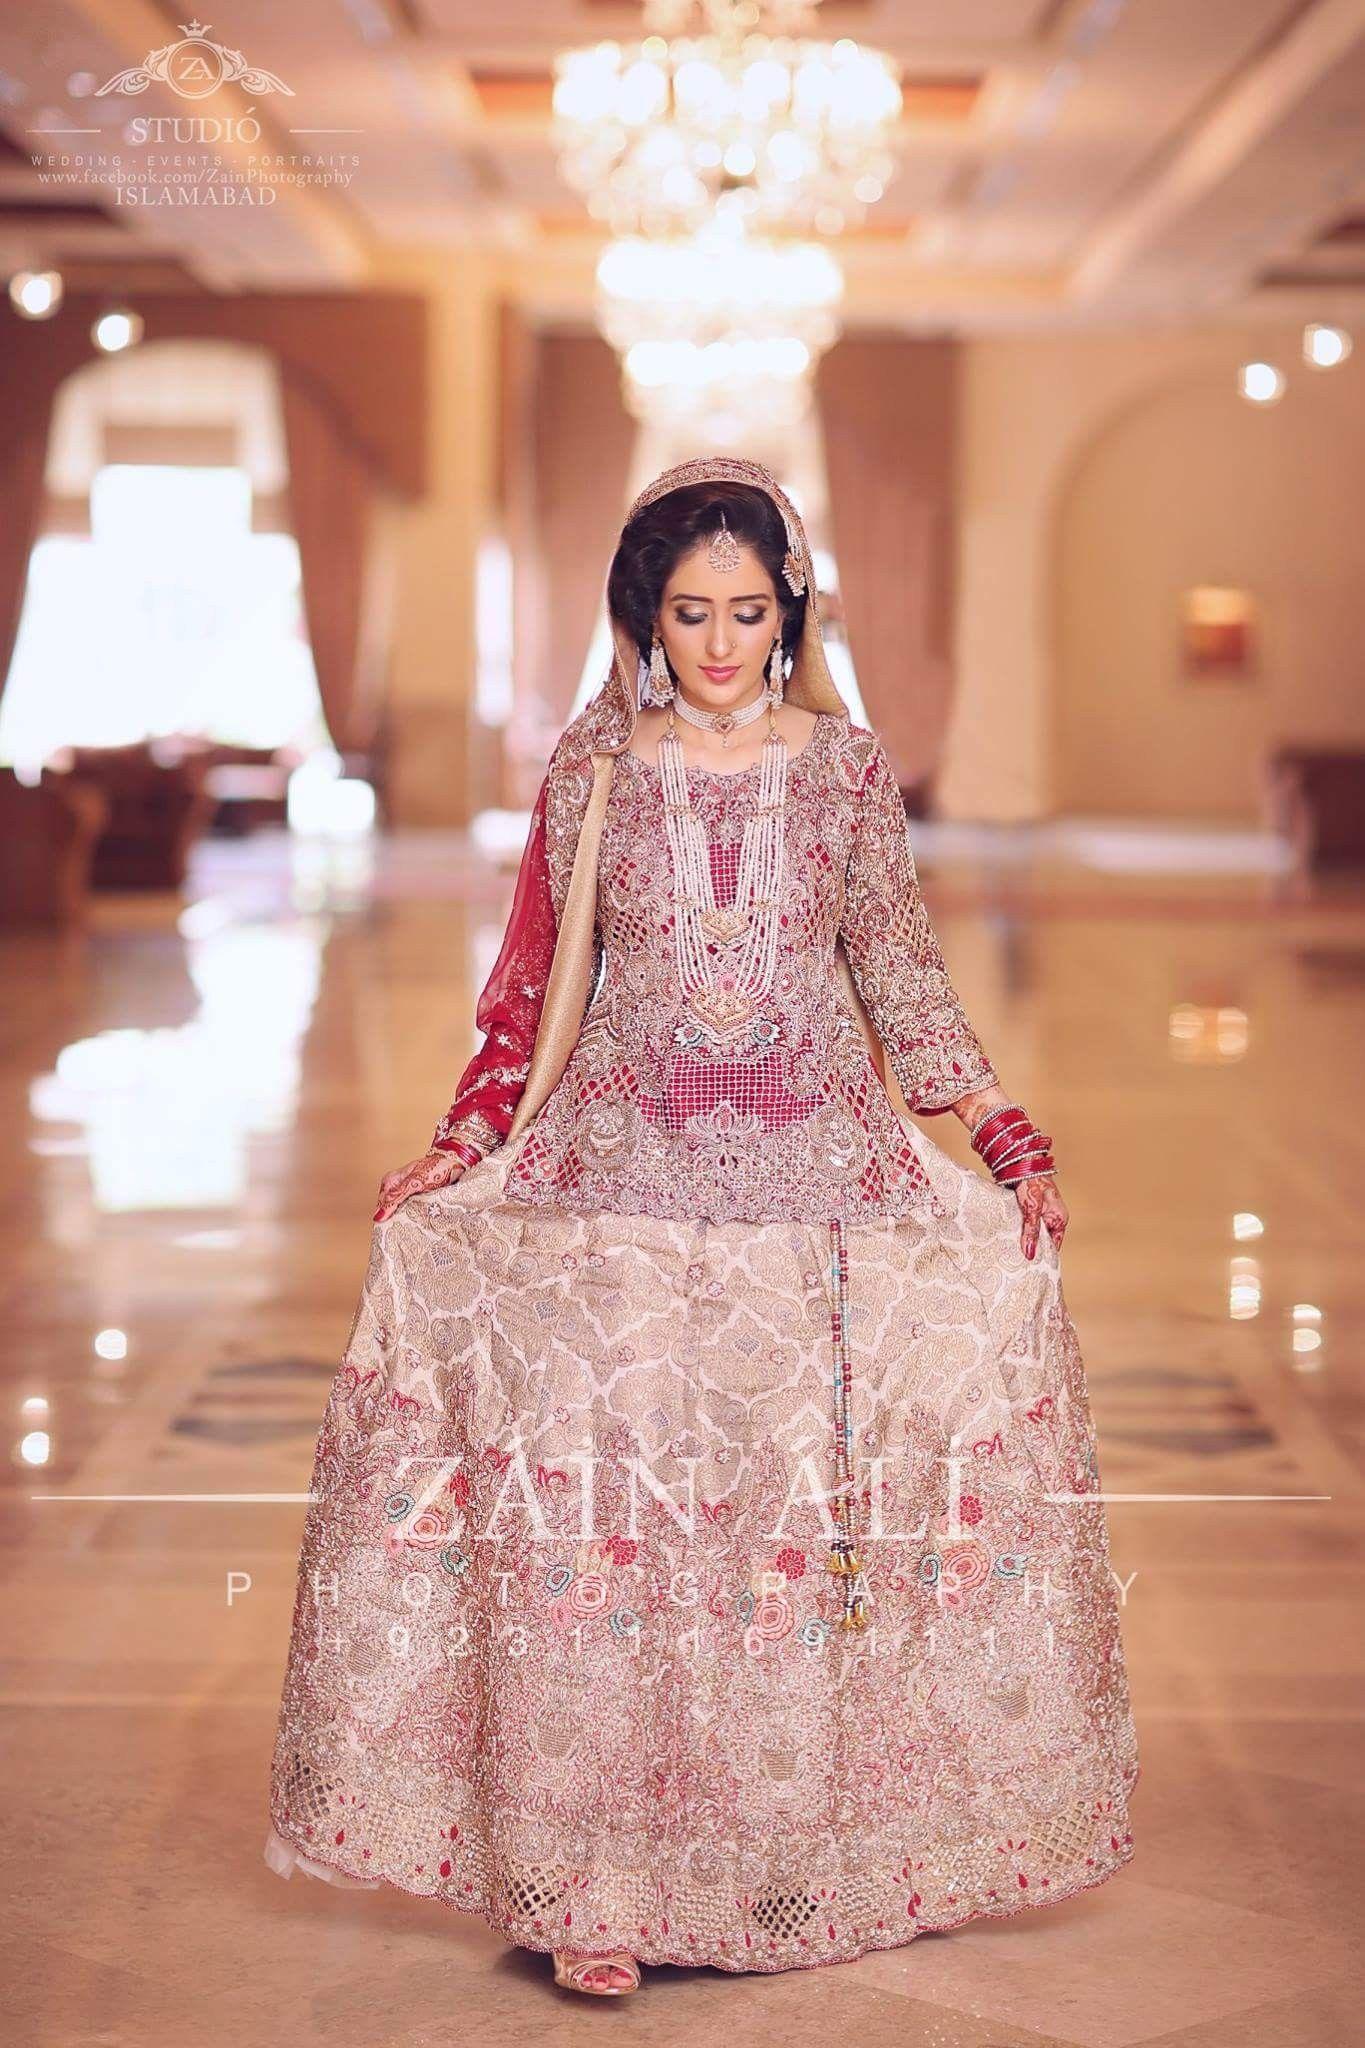 Pin de Neelam Nabeela en wedding | Pinterest | Boda